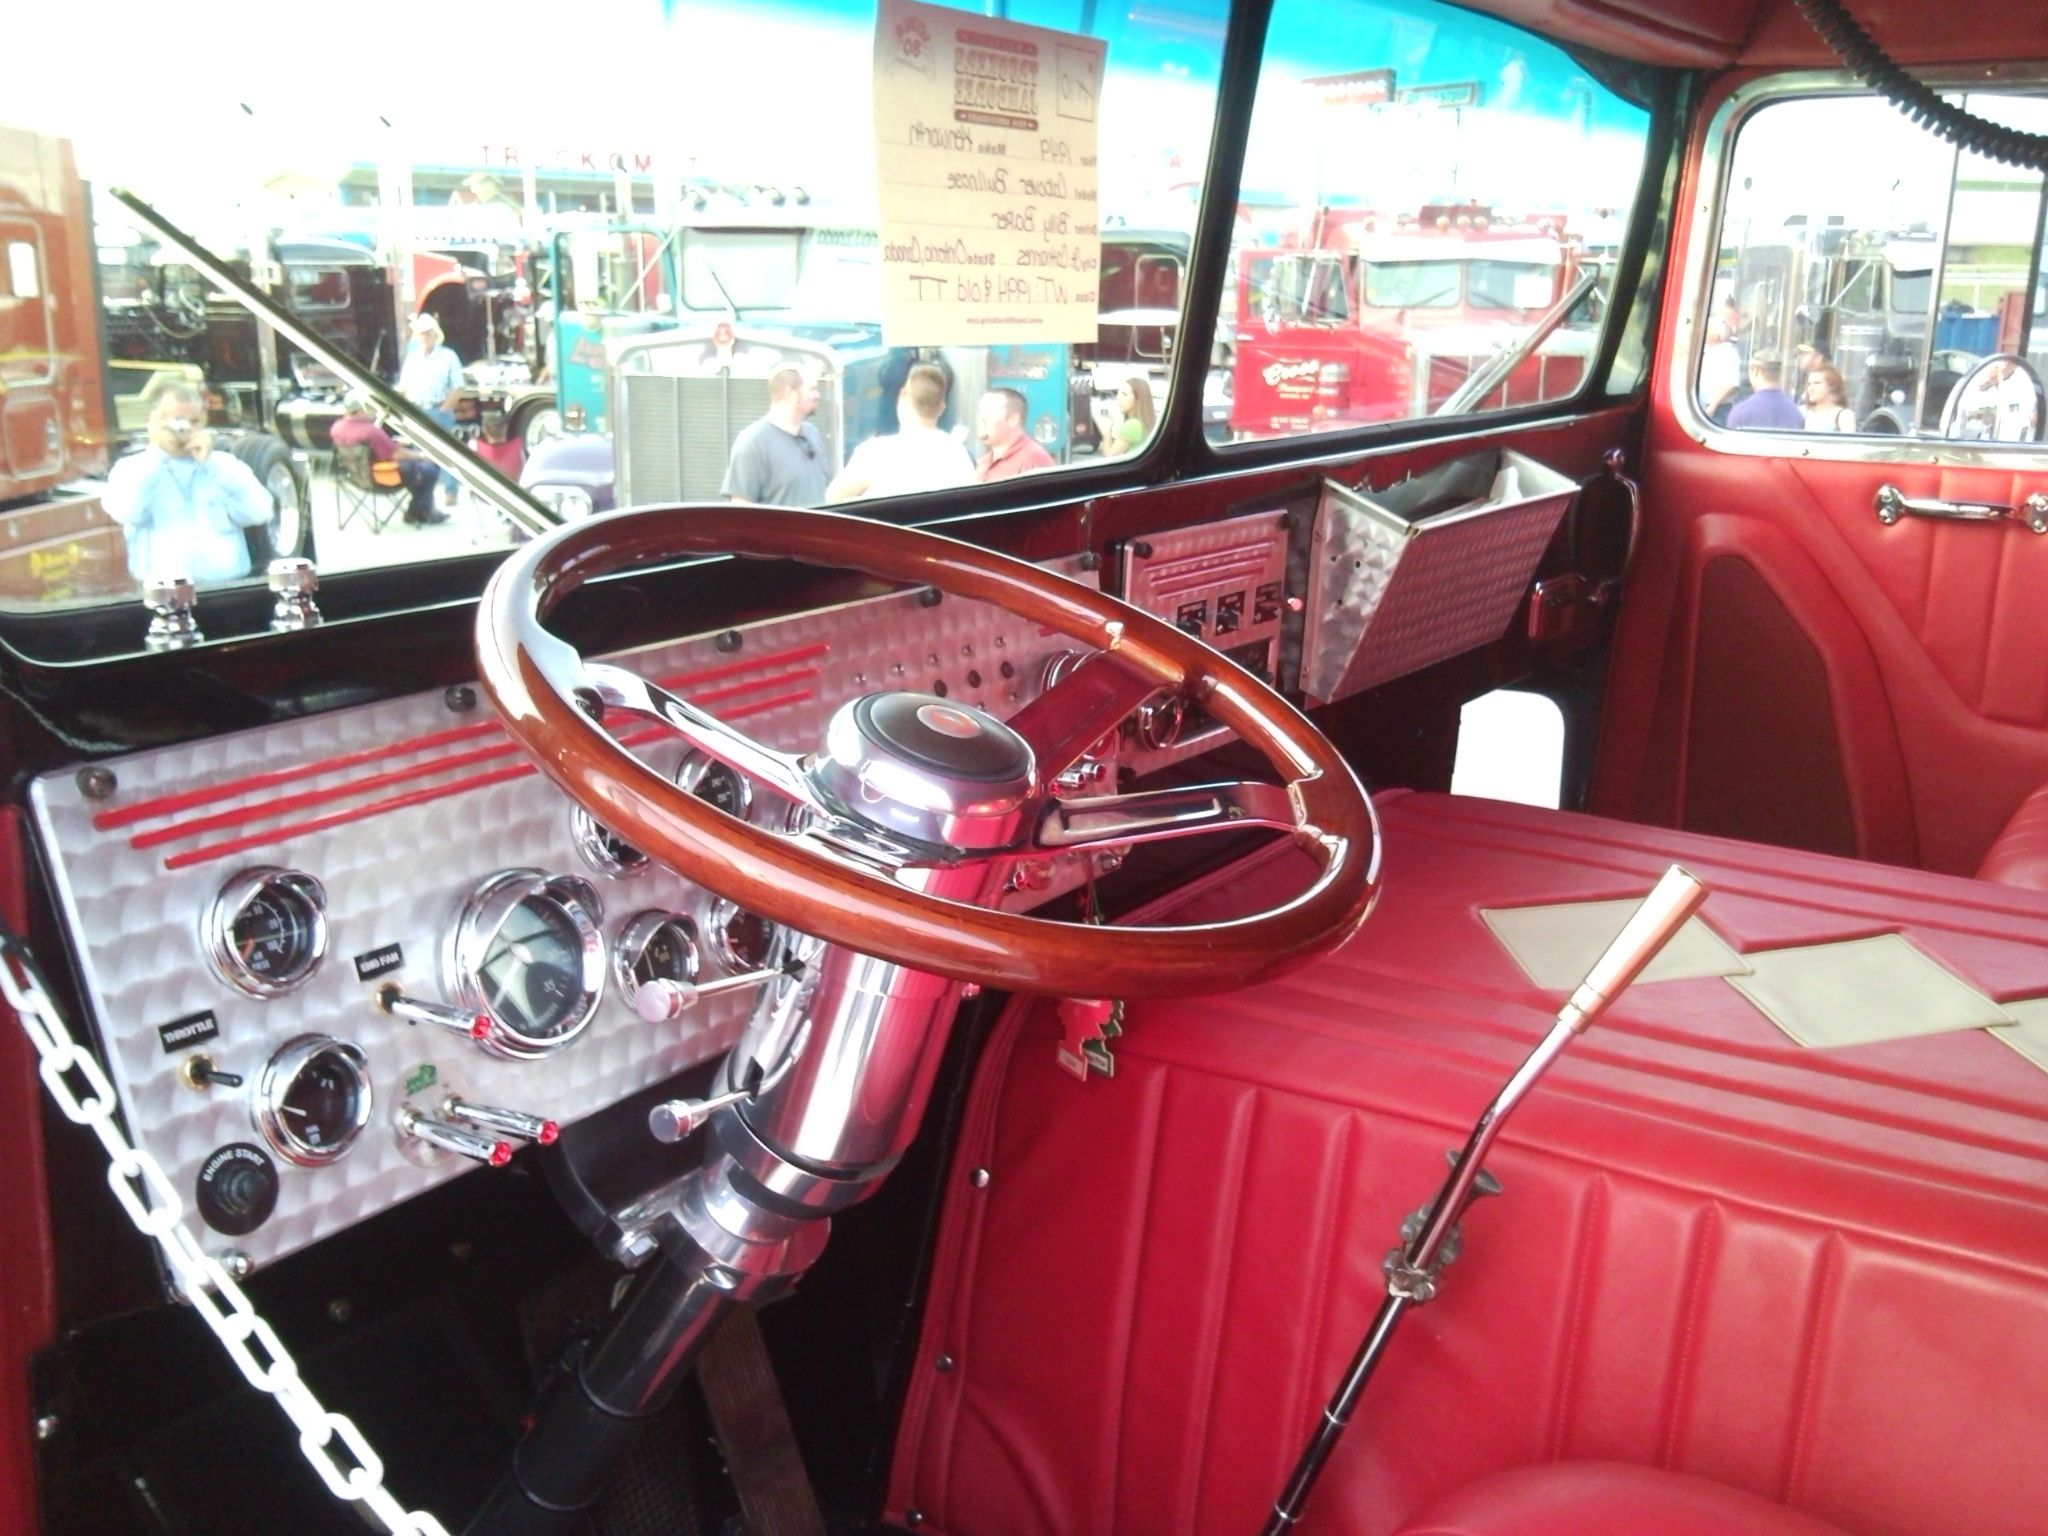 1950 39 s bubble nose kenworth interior trucks pinterest truck interior kenworth trucks and for Volvo semi truck interior accessories